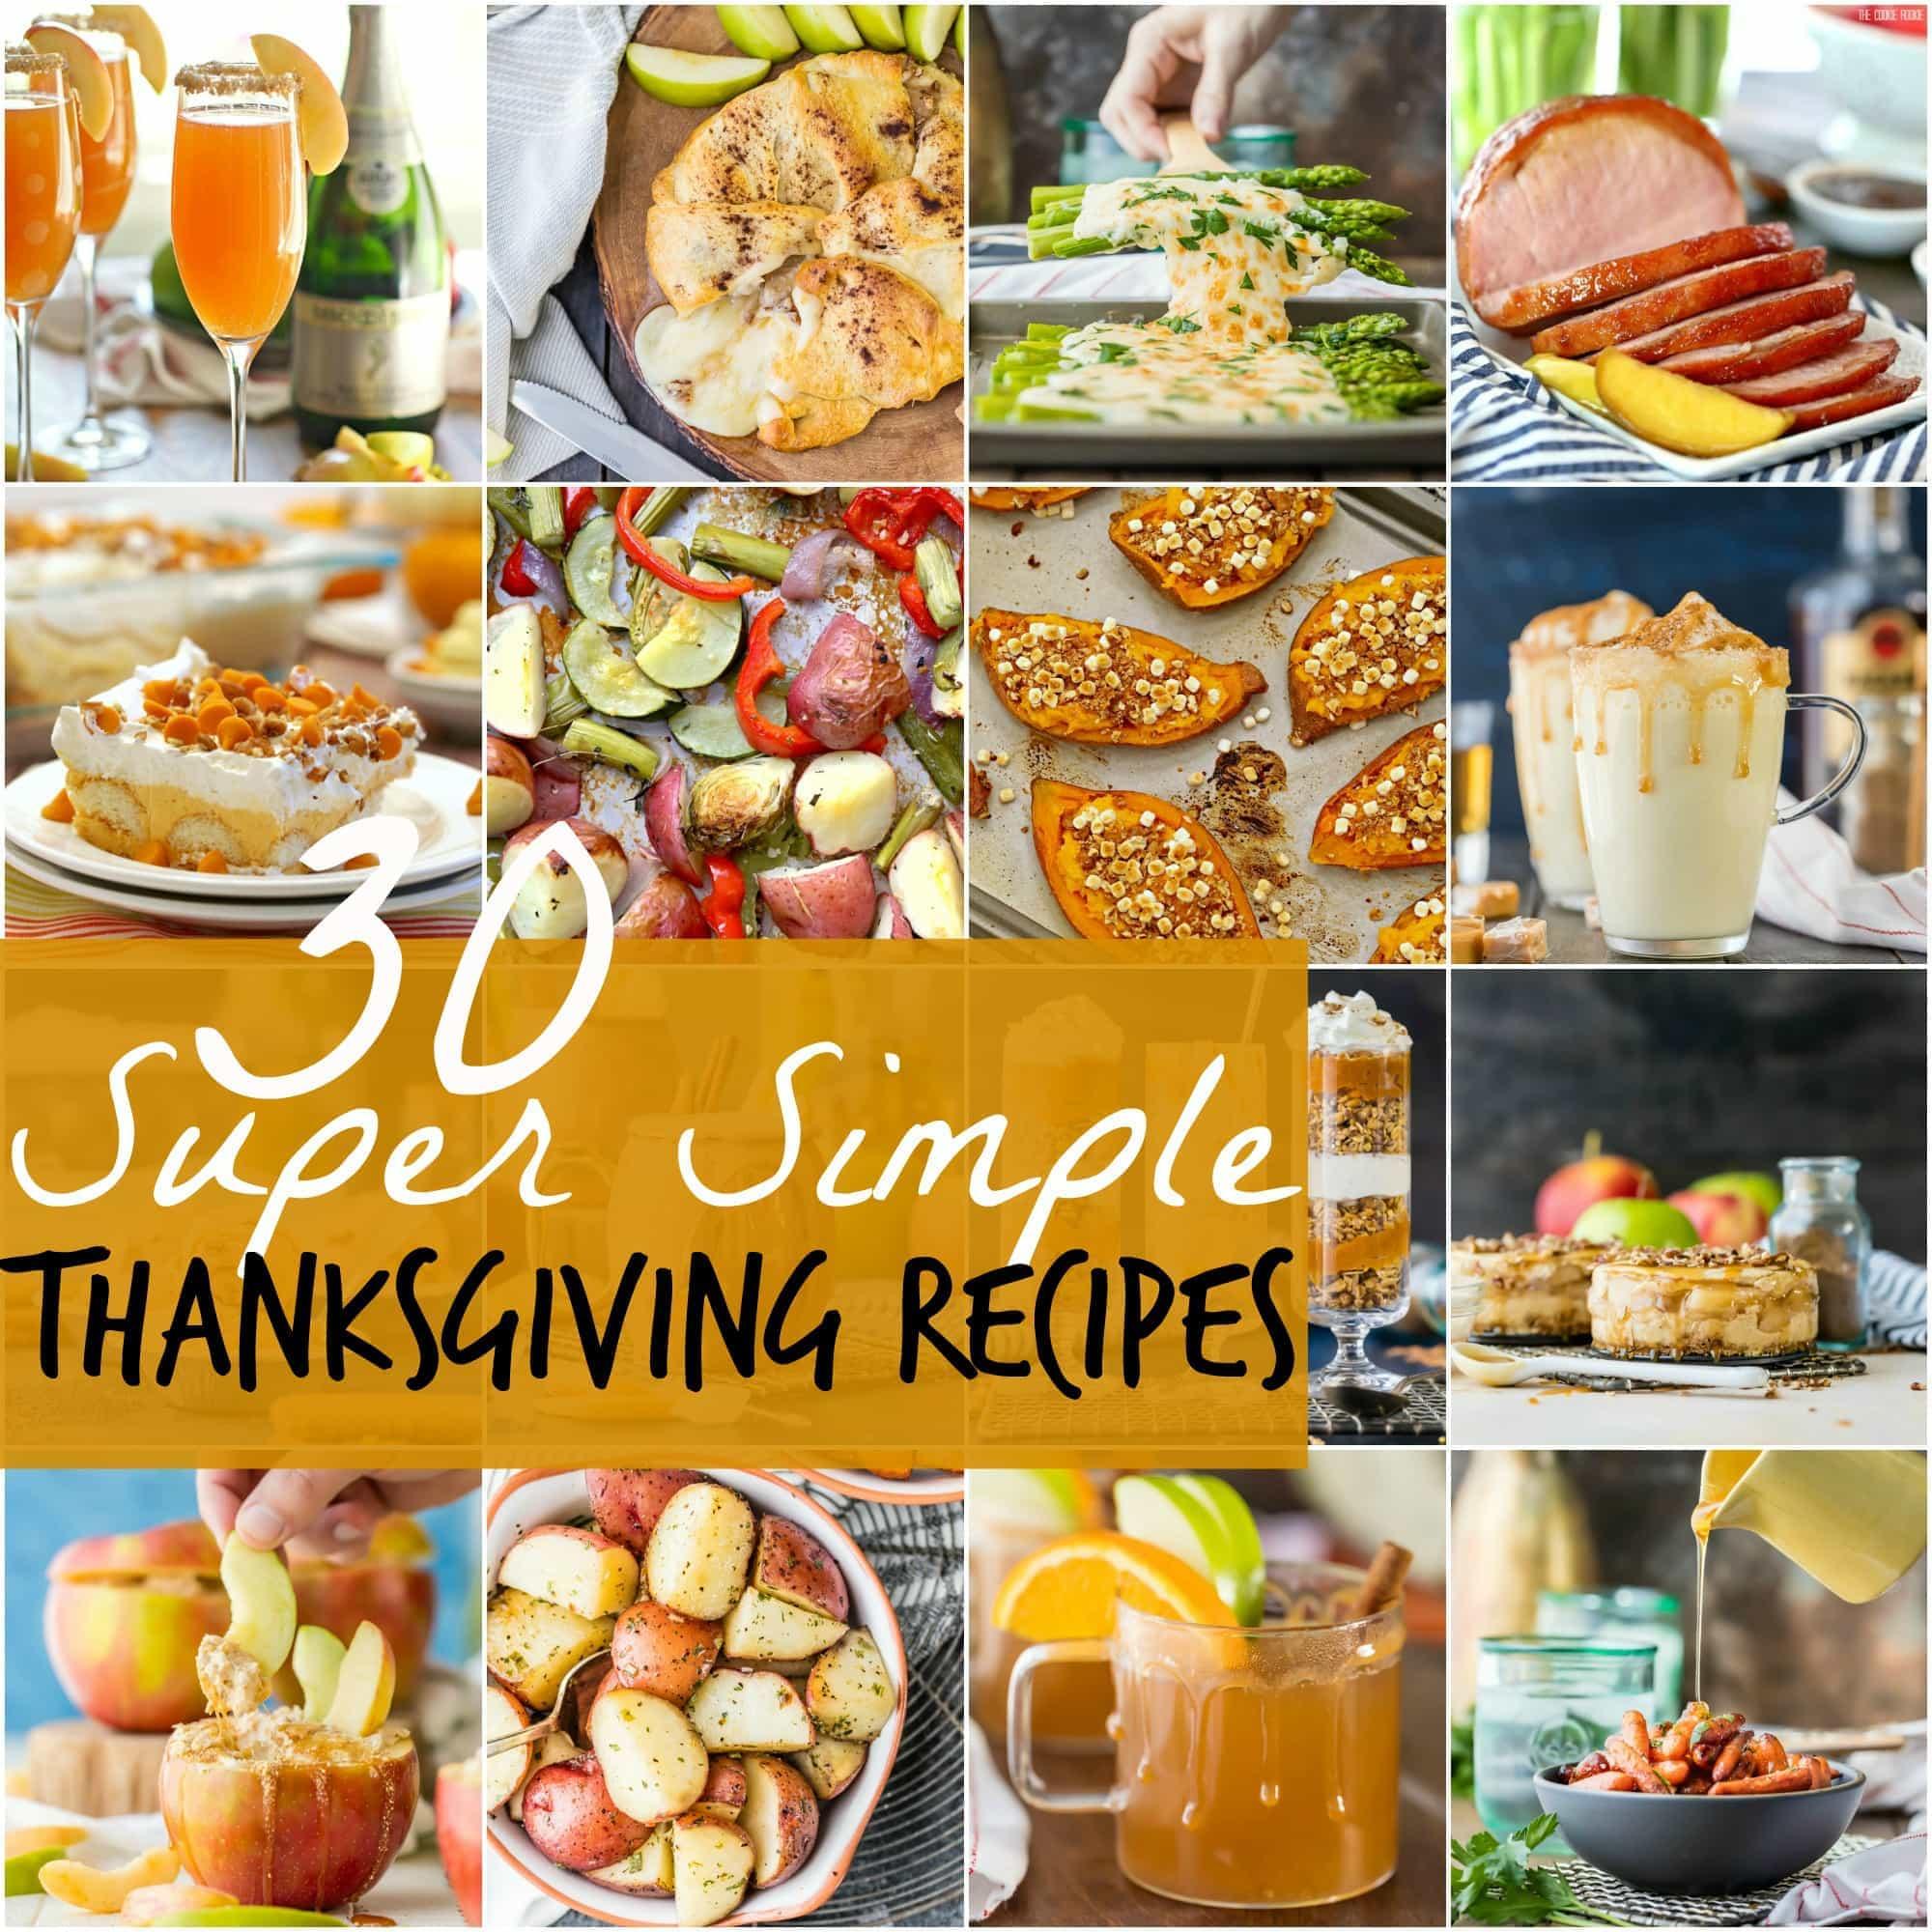 Recipes Thanksgiving: 30 SUPER SIMPLE Thanksgiving Recipes